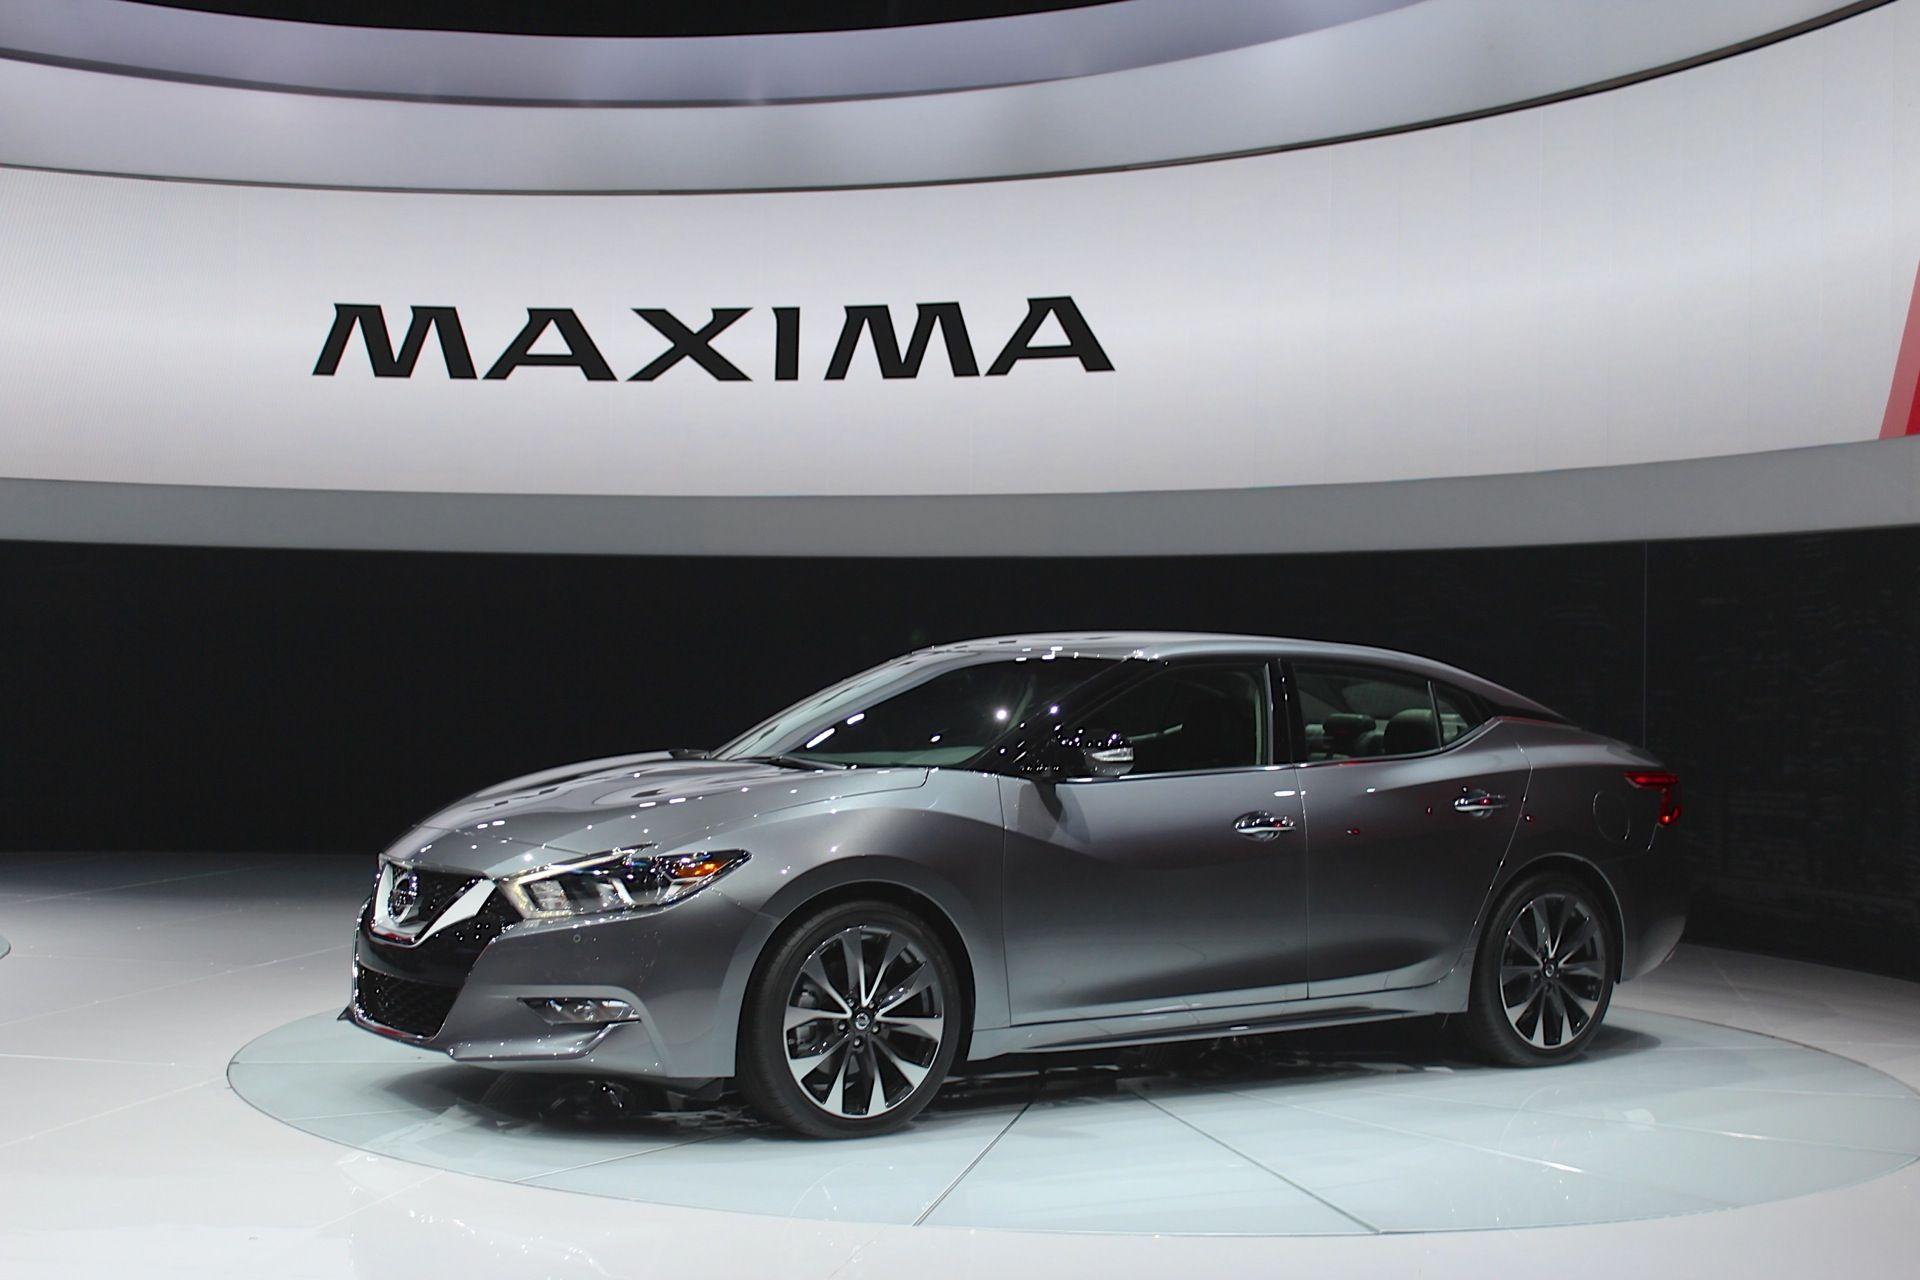 nissan maxima 2016 Google Search Maxima Nissan